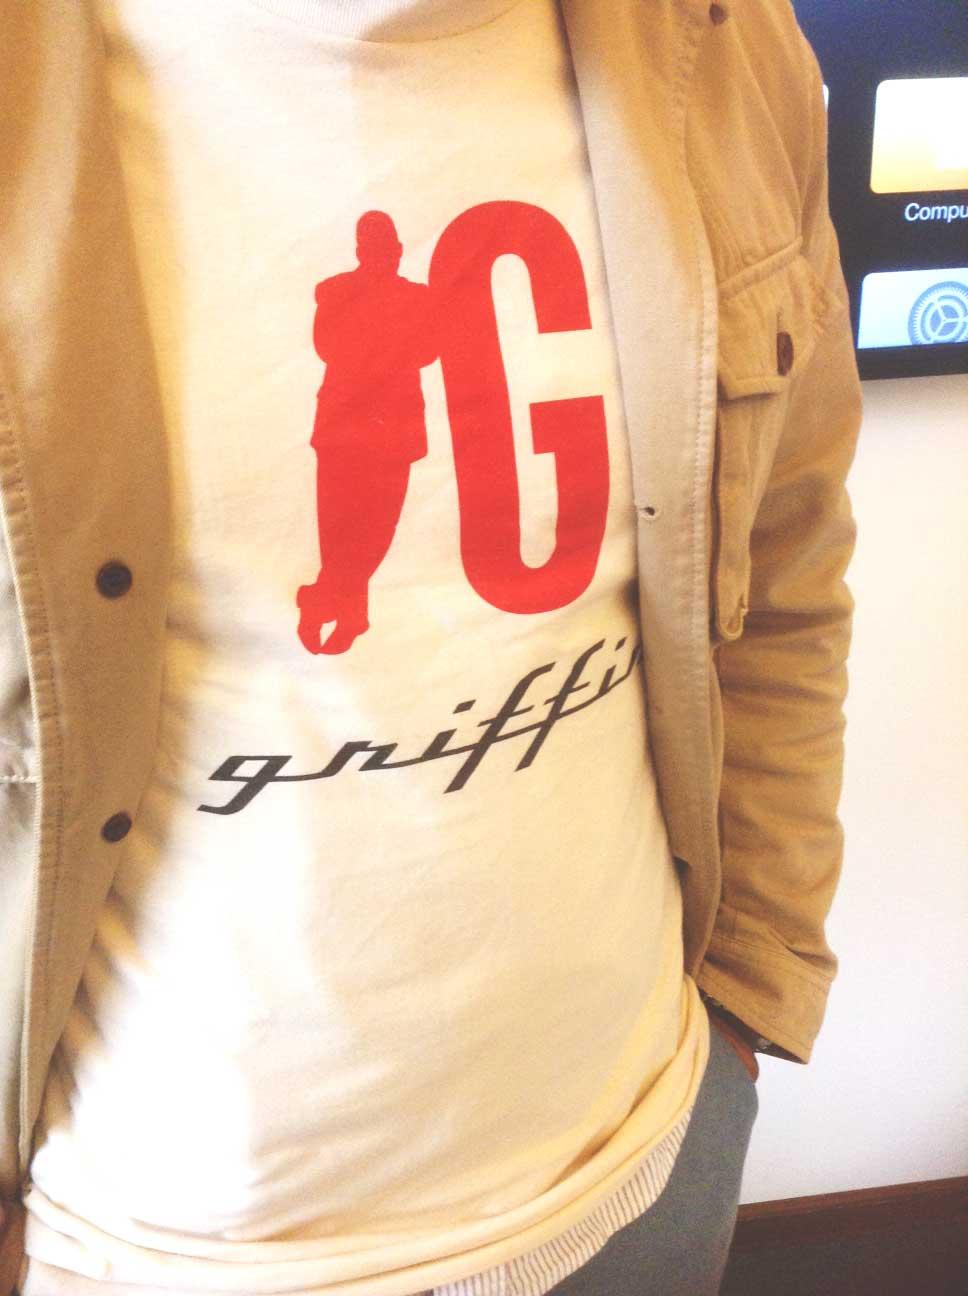 GriffinShirt1.jpg